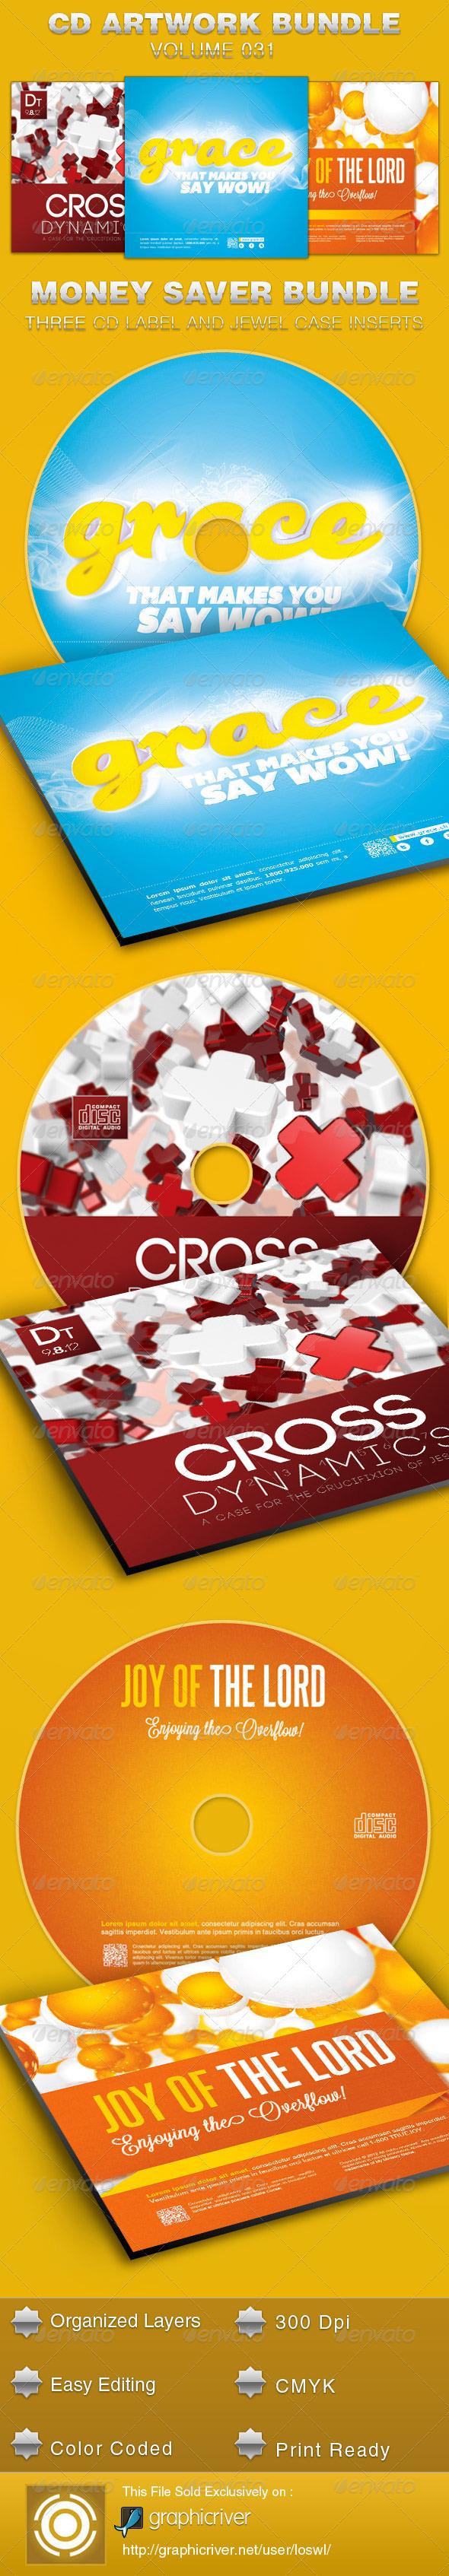 GraphicRiver CD Cover Artwork Template Bundle-Vol 031 5437808